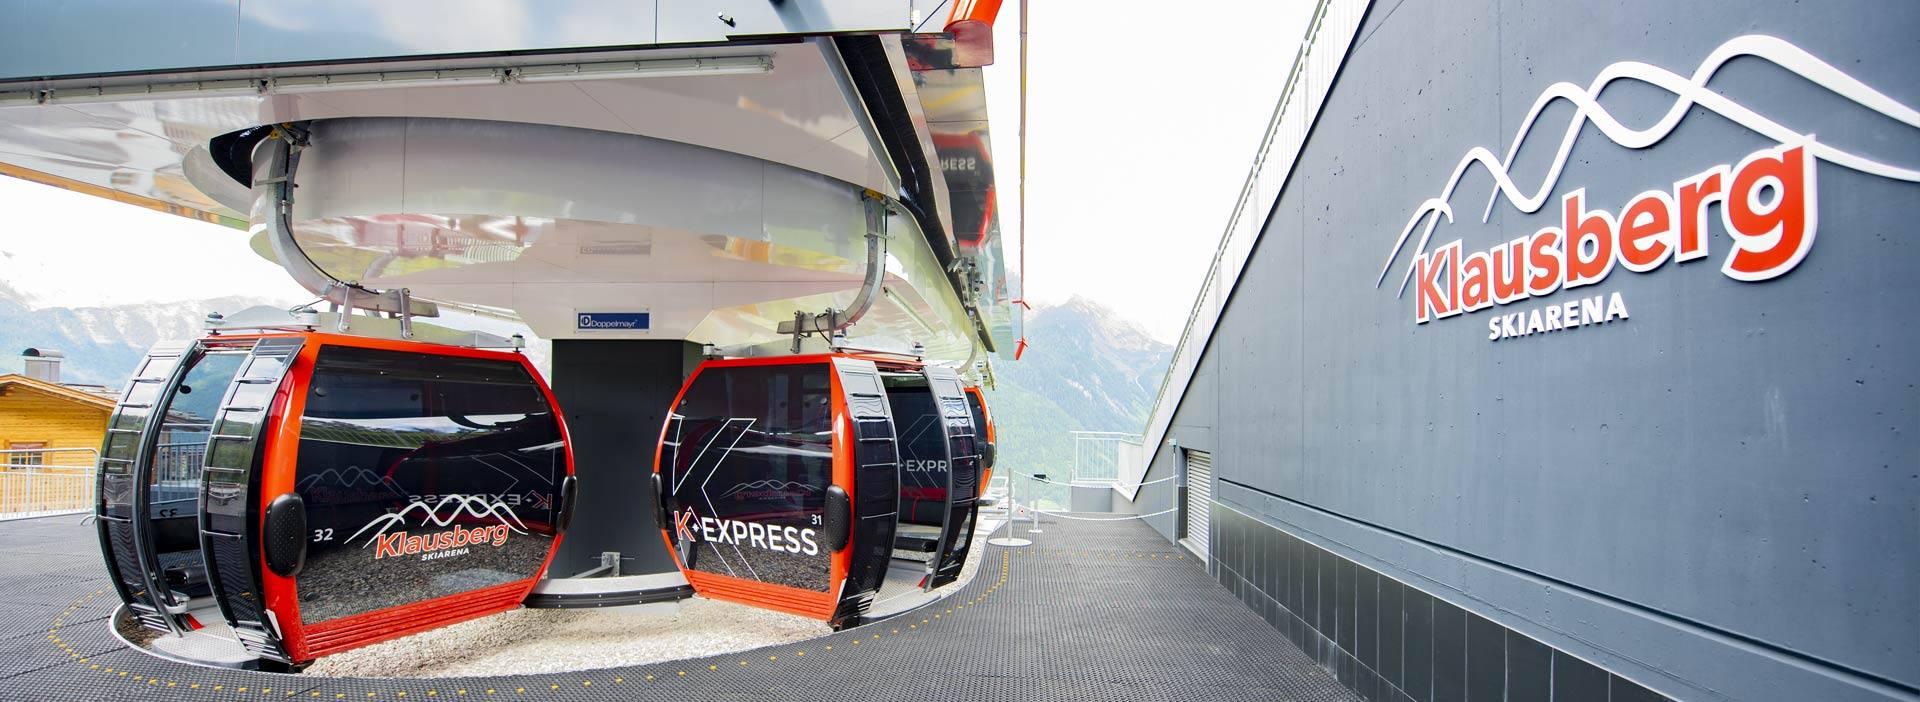 Cabinovia Klausberg Express